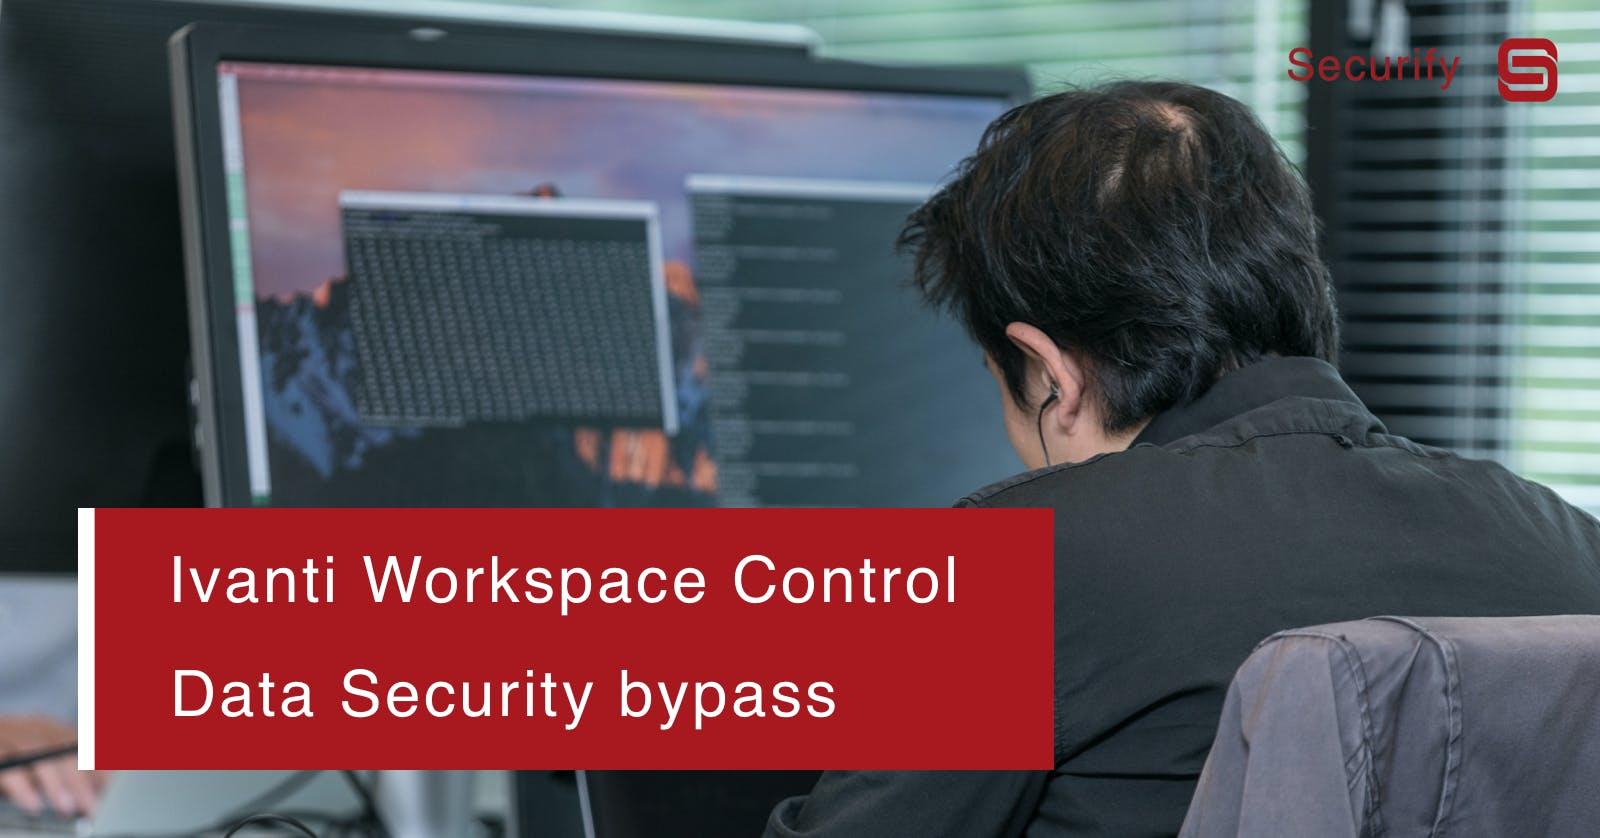 Ivanti Workspace Control Data Security bypass via localhost UNC path